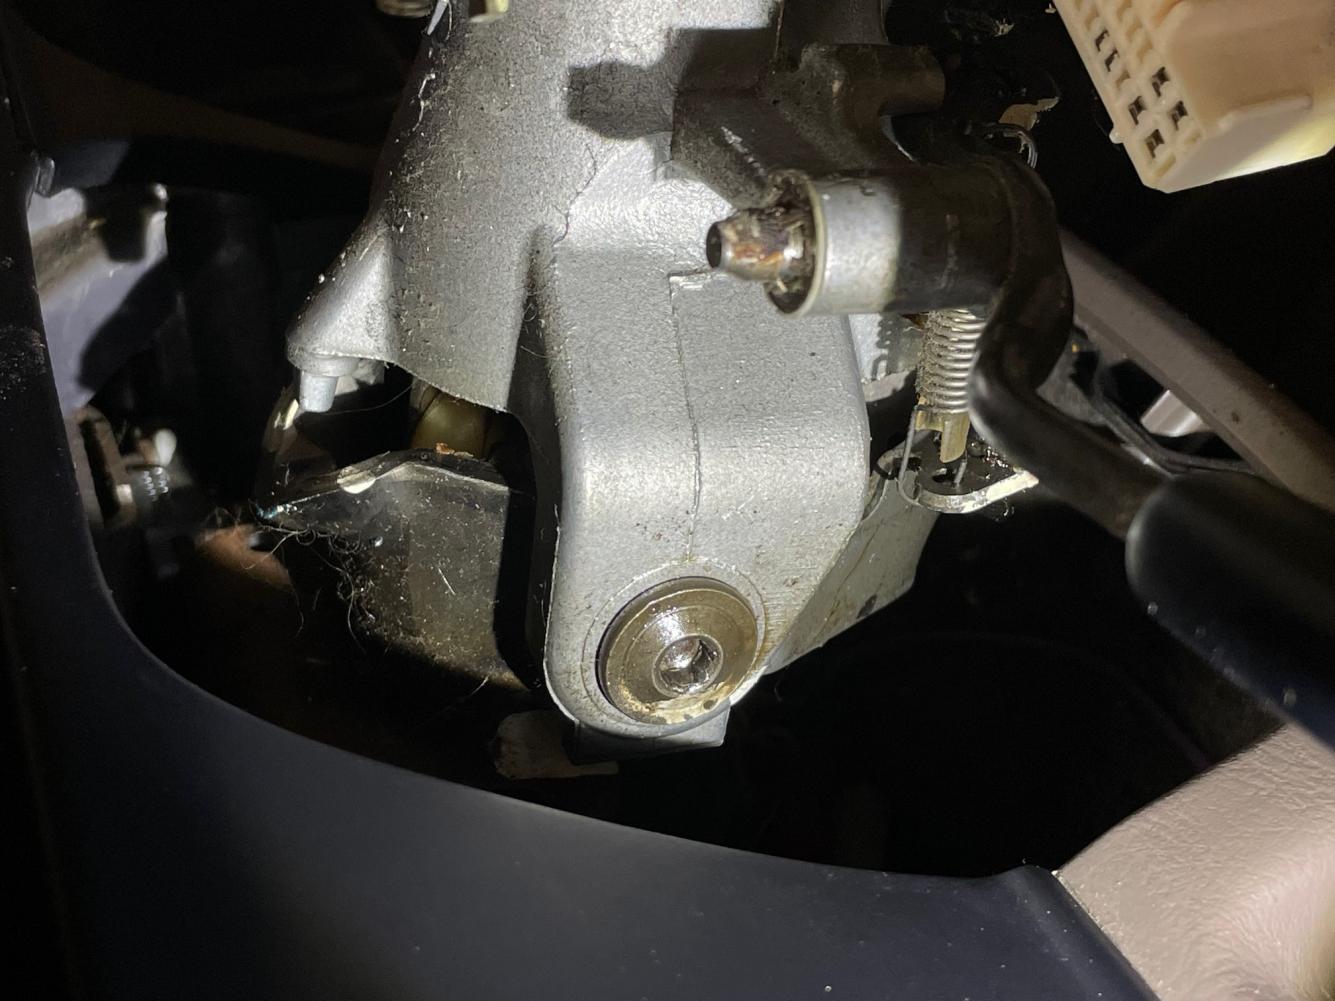 Stripped steering column bolt, any options here?-img_1939-2-jpg